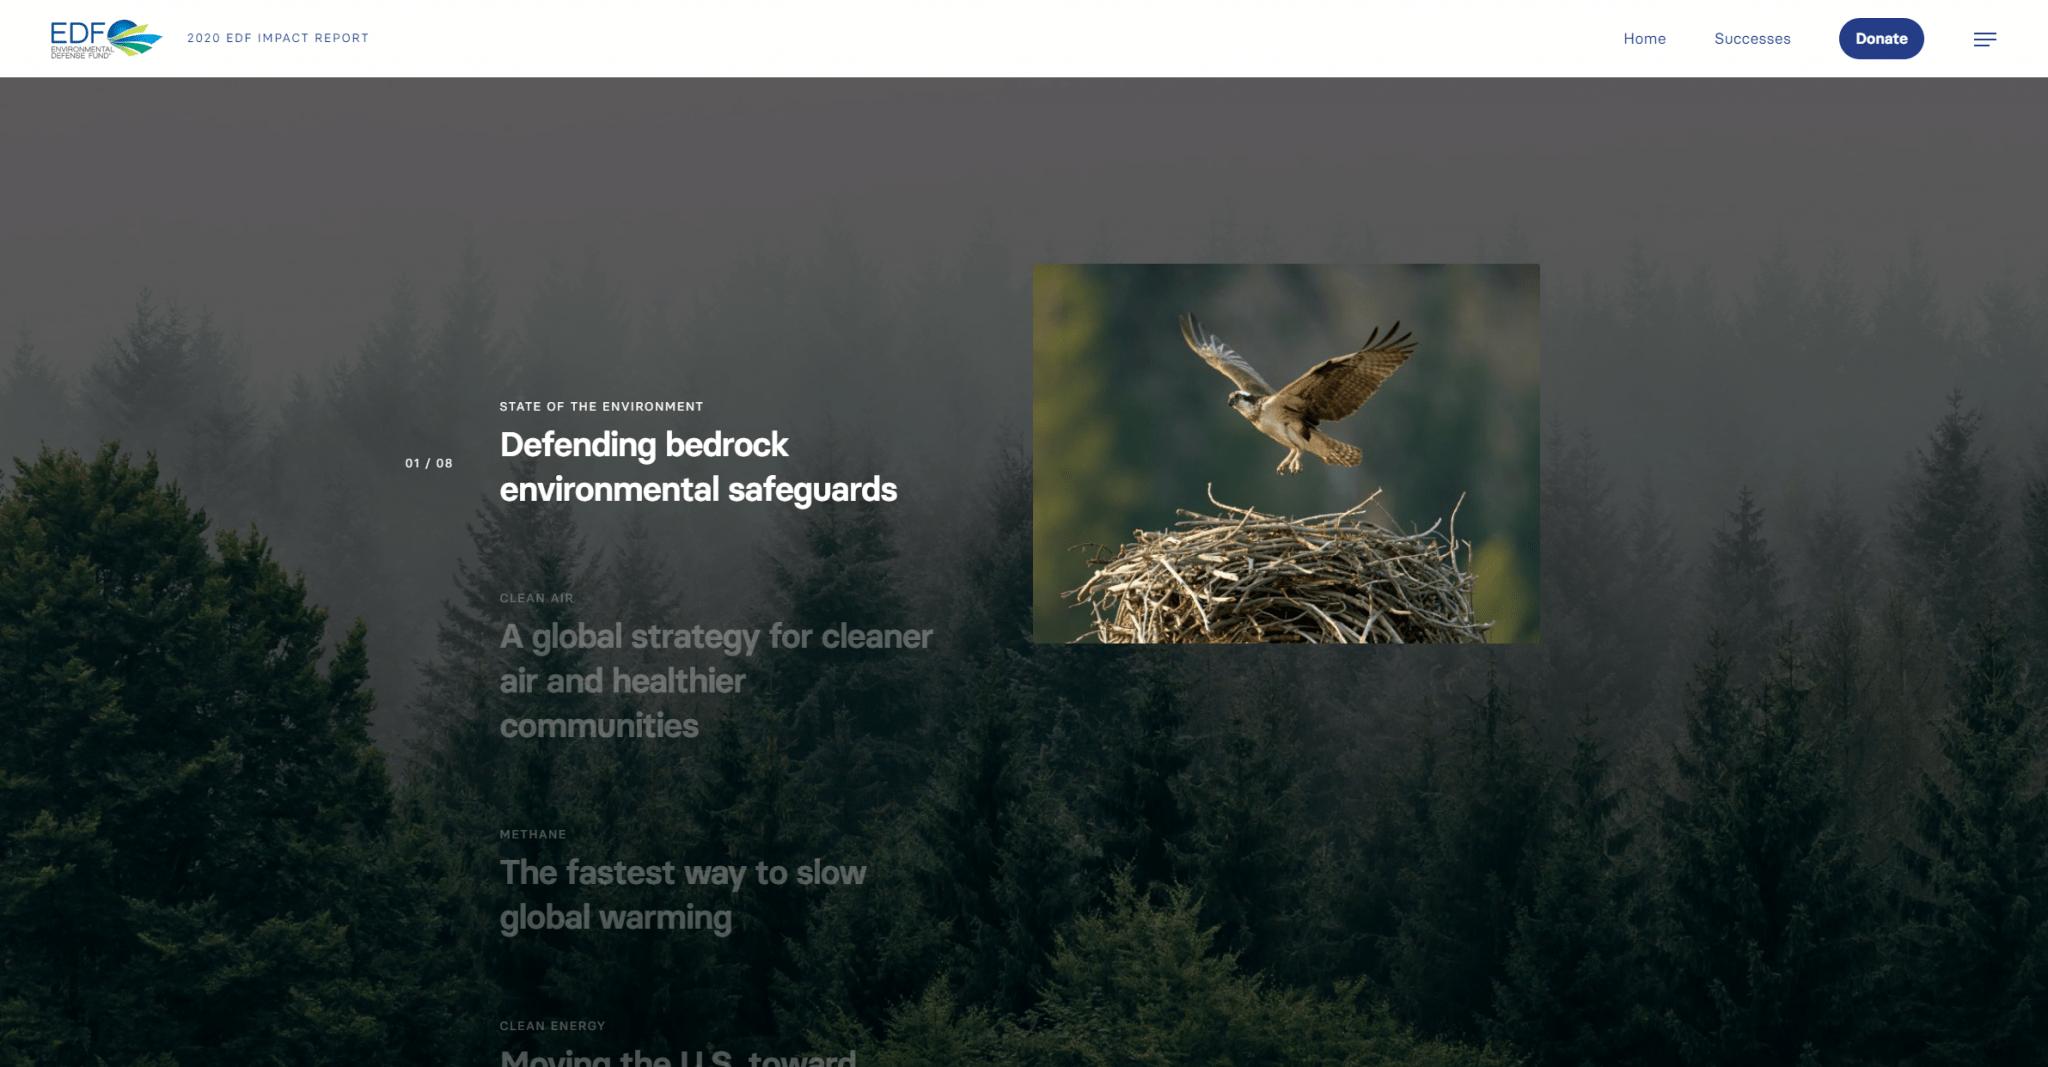 https___impact2020.edf.org_ Home – Environmental Defense Fund – 2020 Impact Report_002